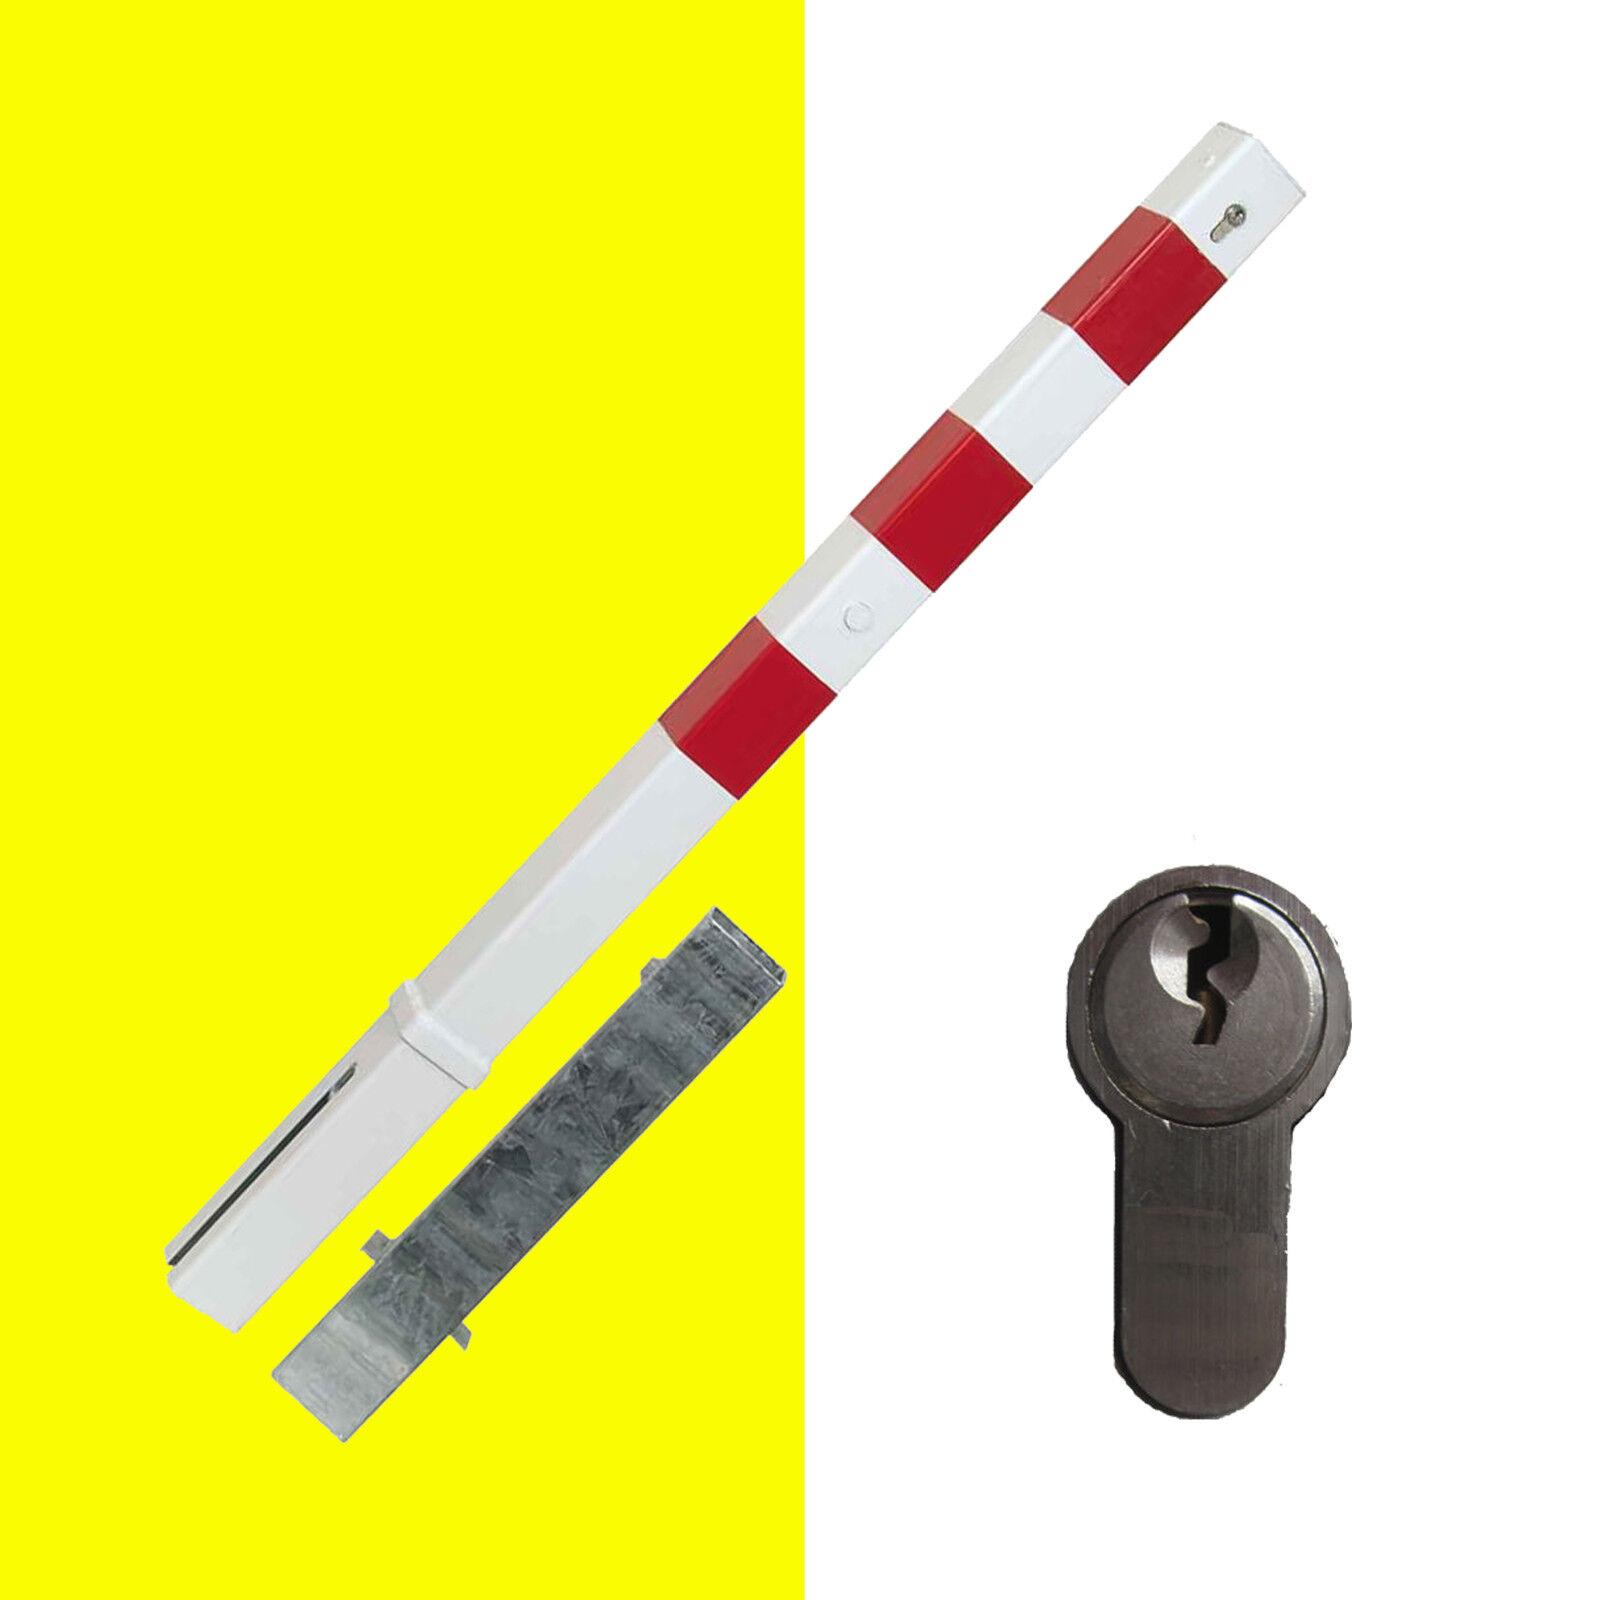 Absperrpfosten, Feuerwehrpfosten, 70 x 70 mm herausnehmbar, Profilzylinderschloß